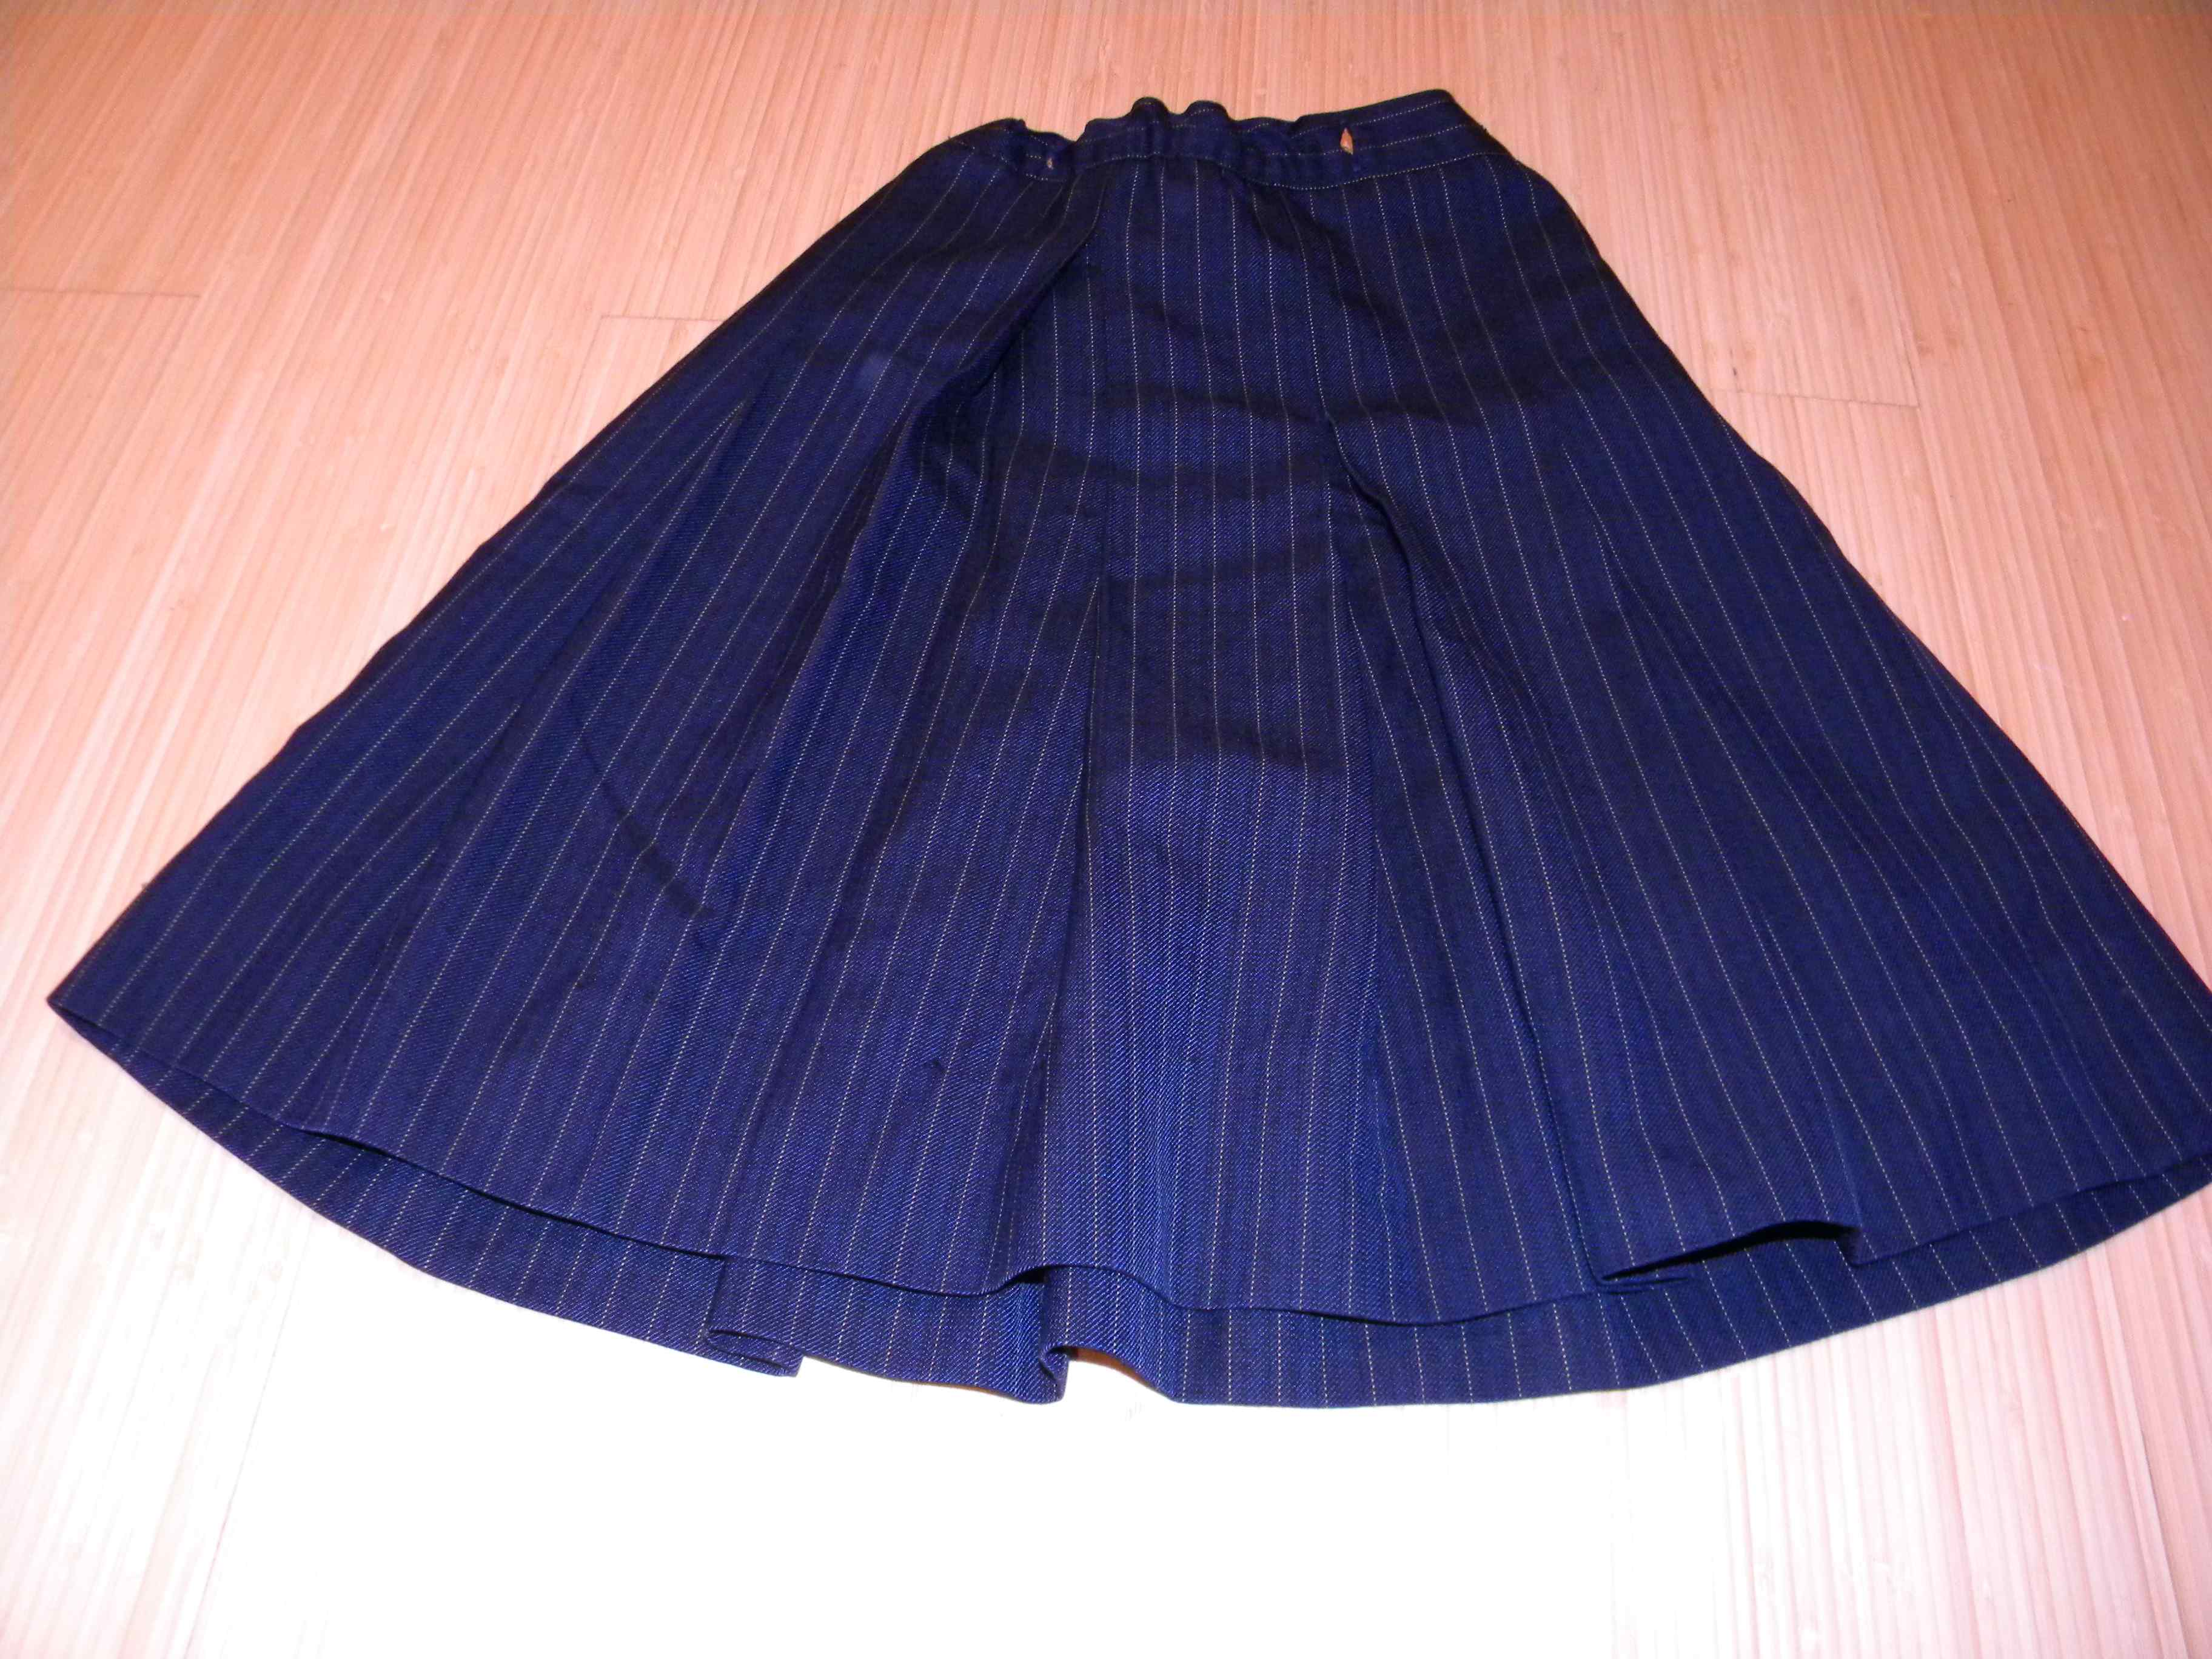 8 Apsley Place Kaleen Skirt